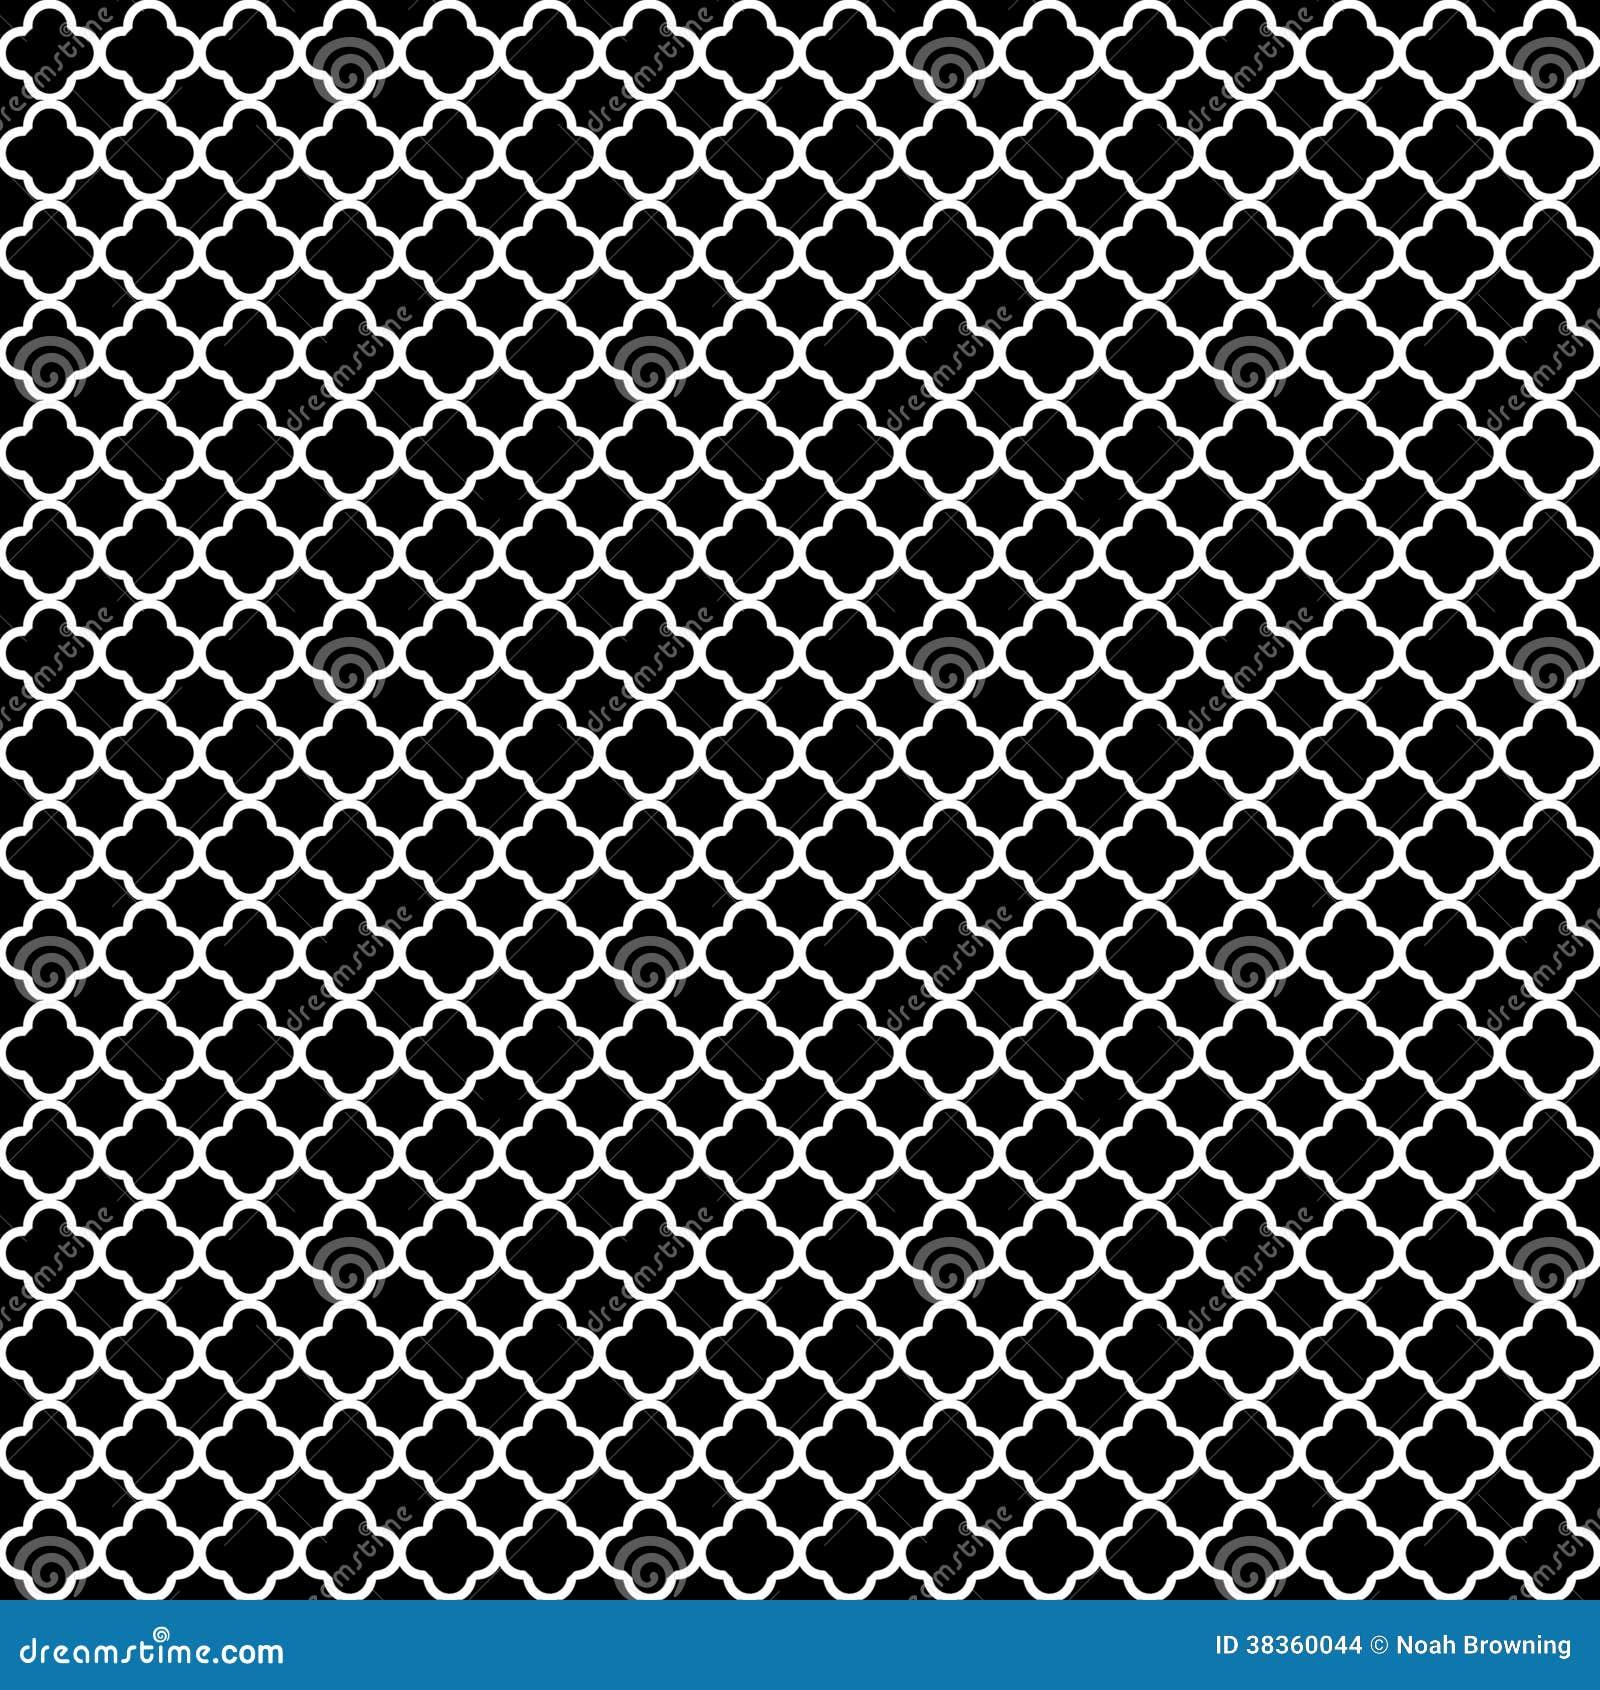 Quatrefoil Pattern Cool Inspiration Ideas